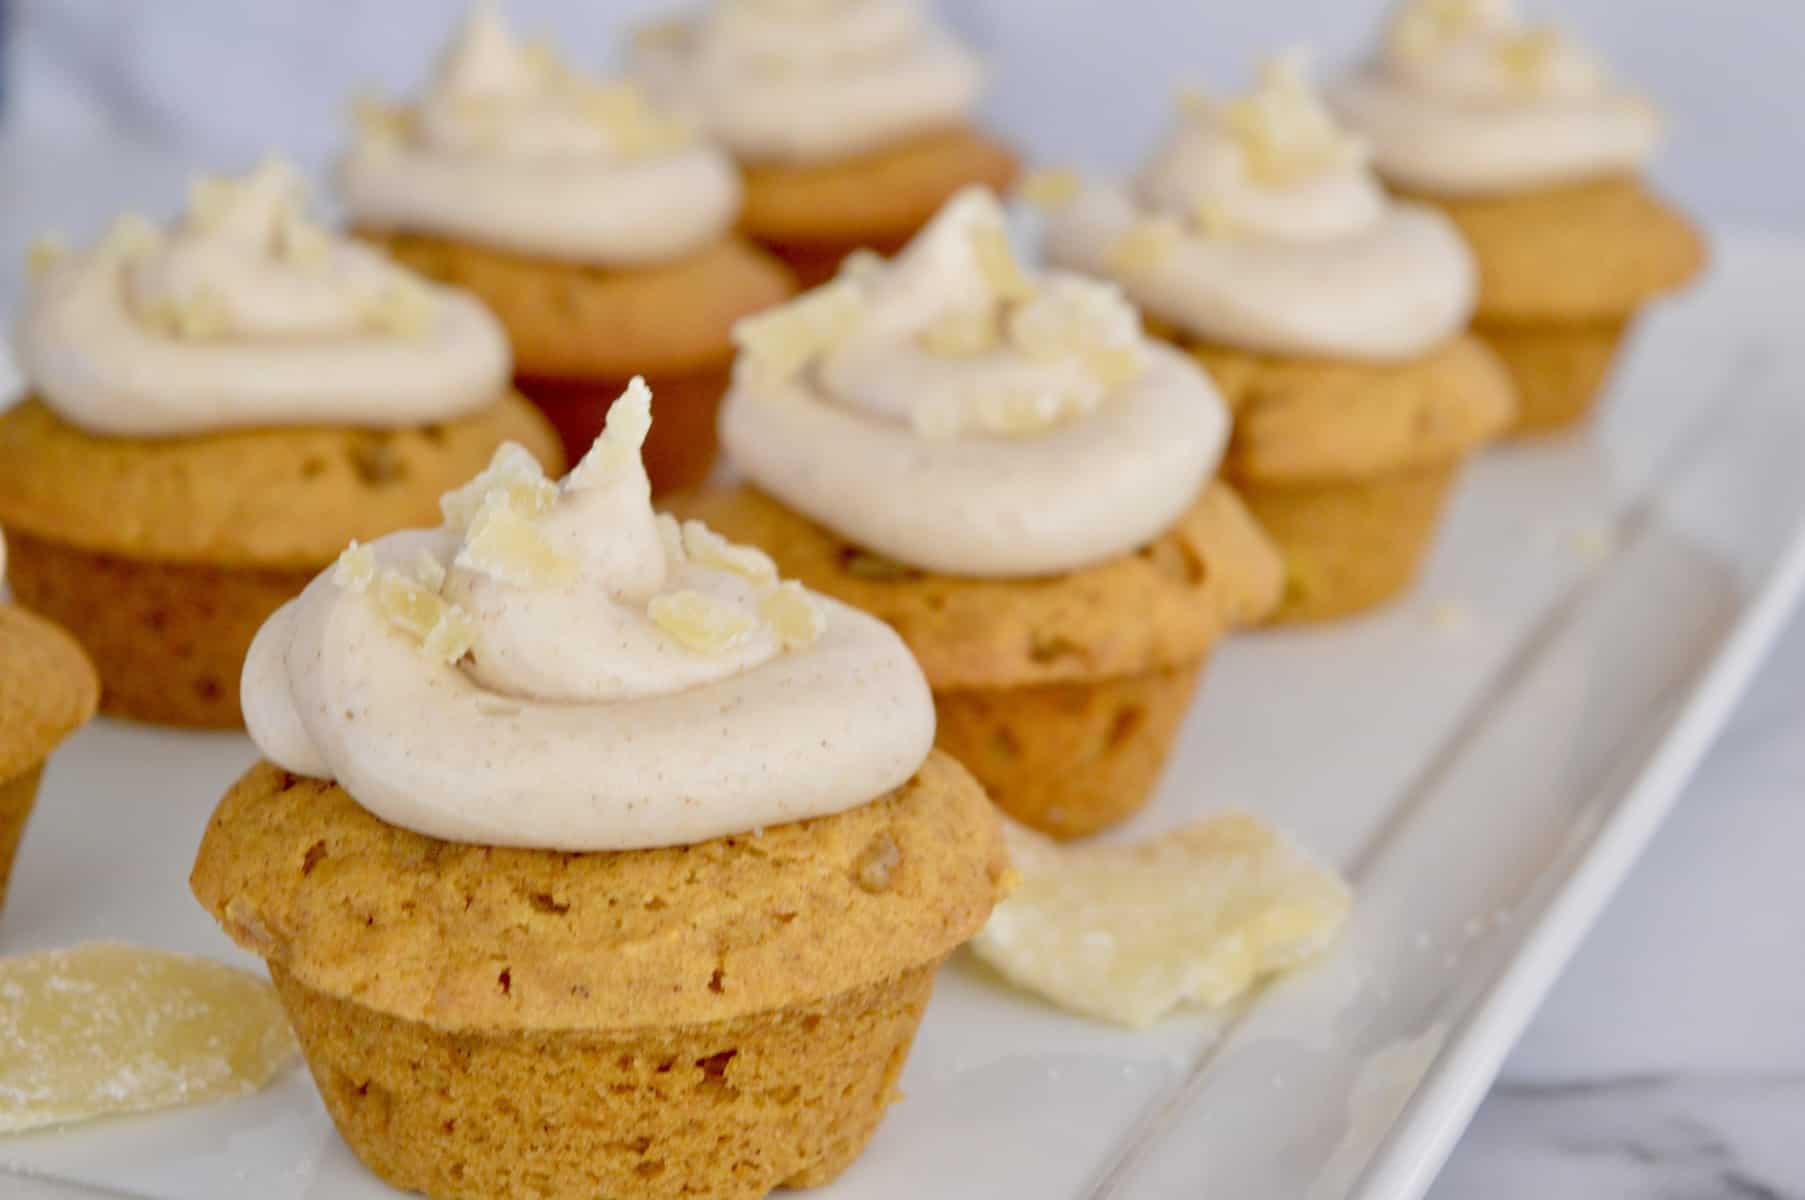 pumpkin ginger cupcakes on a white serving platter.